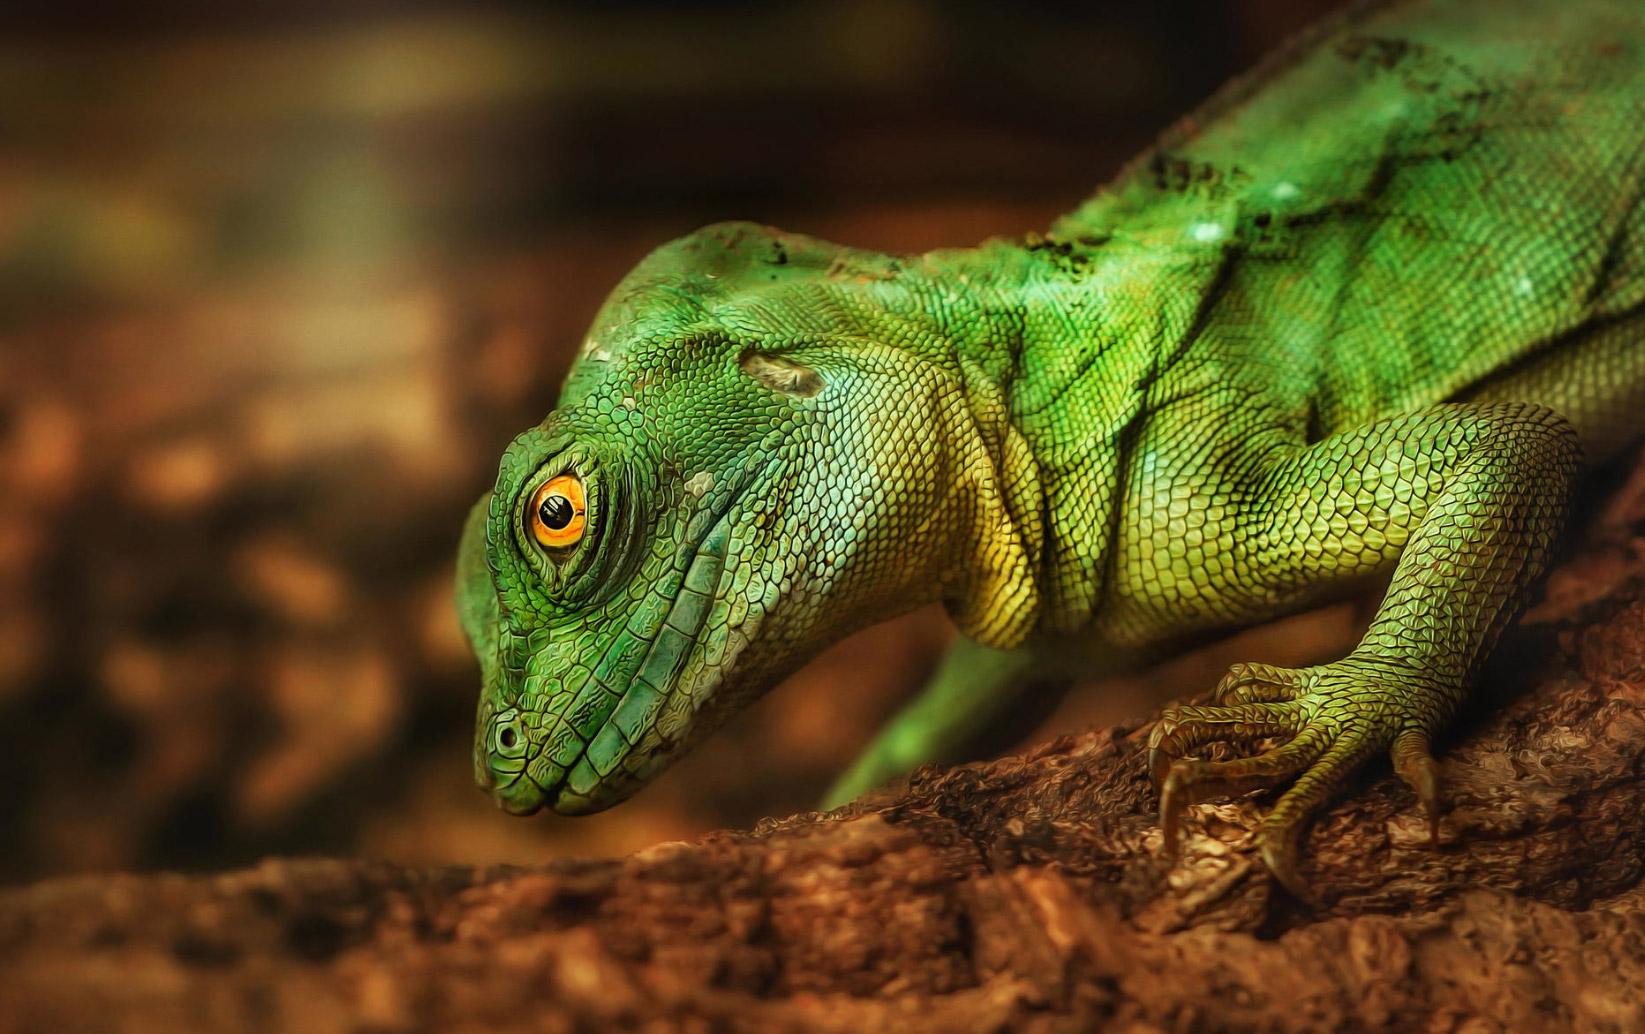 reptiles-amphibians-detlef-knapp-01